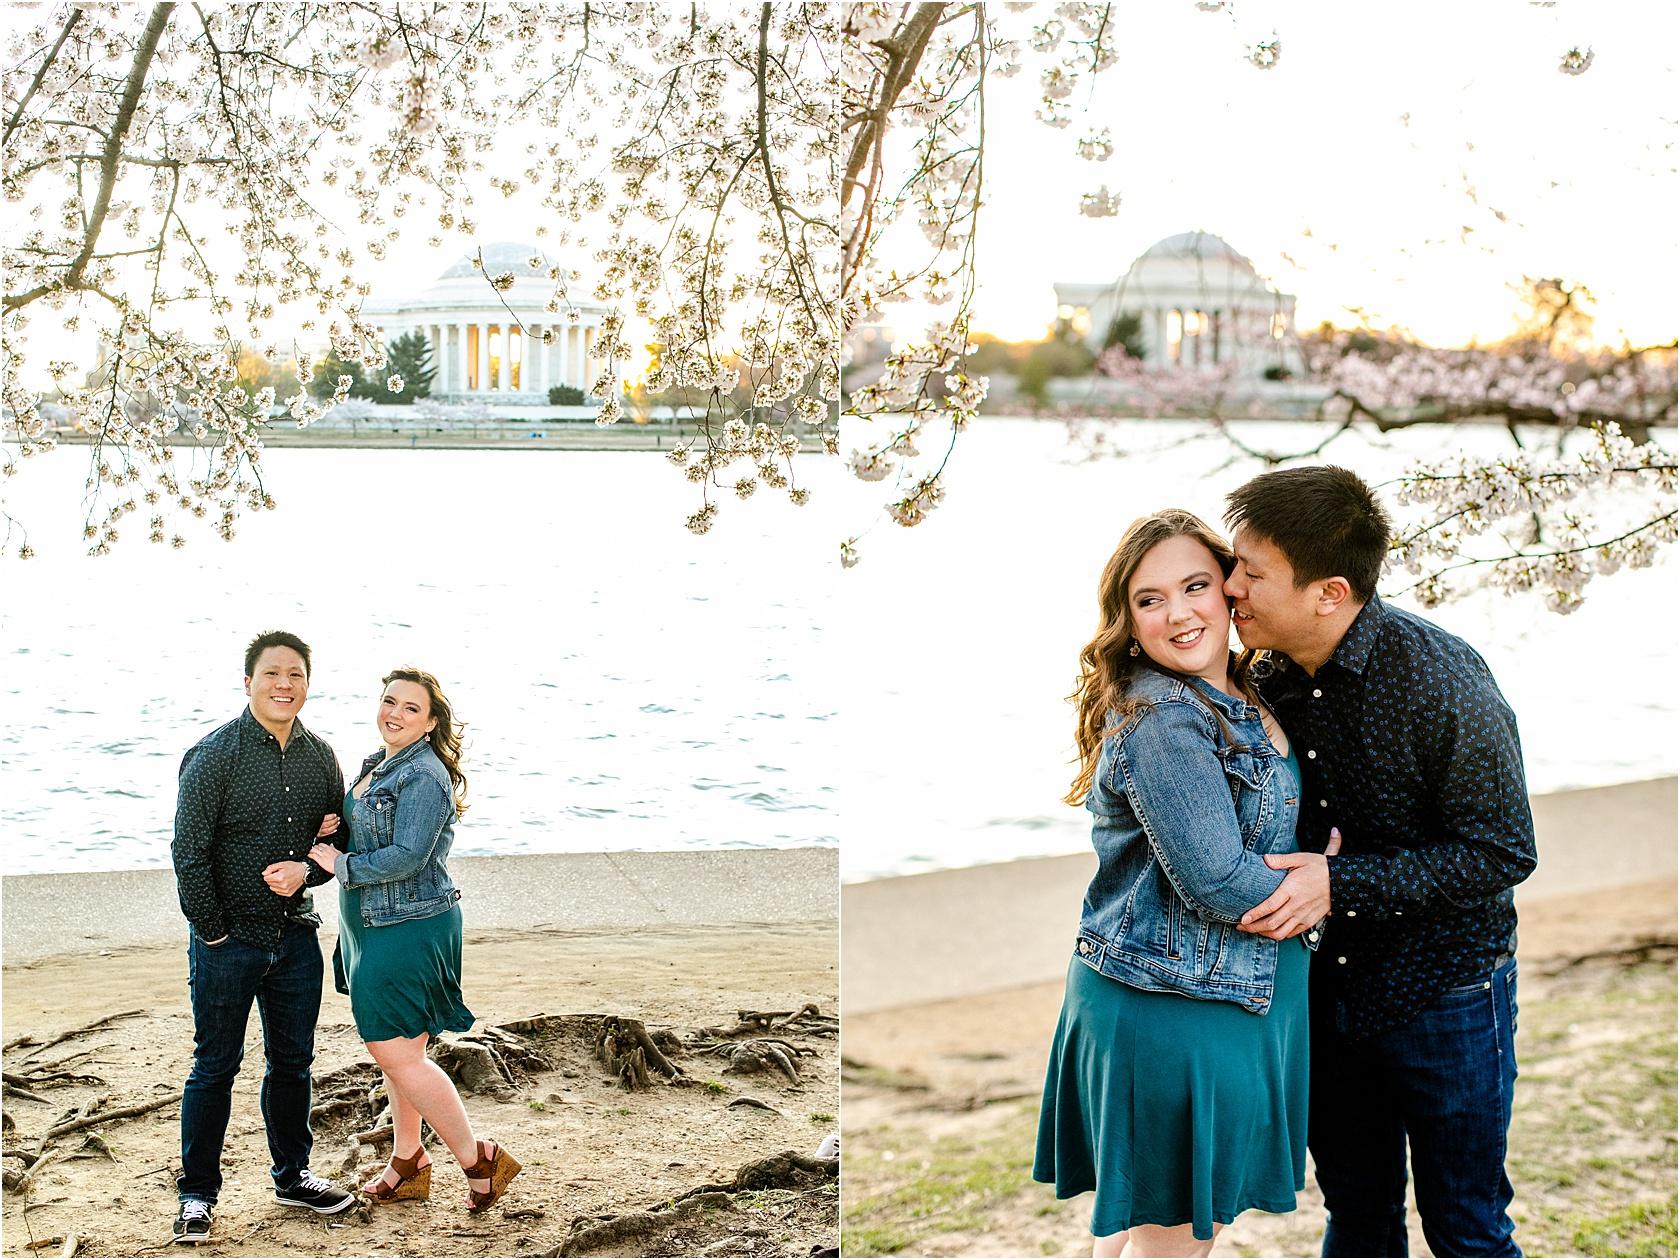 MelissaKevinCherryBlossomsDCEngagementSessionMarch2019LivingRadiantPhotographyphotos_0005.jpg